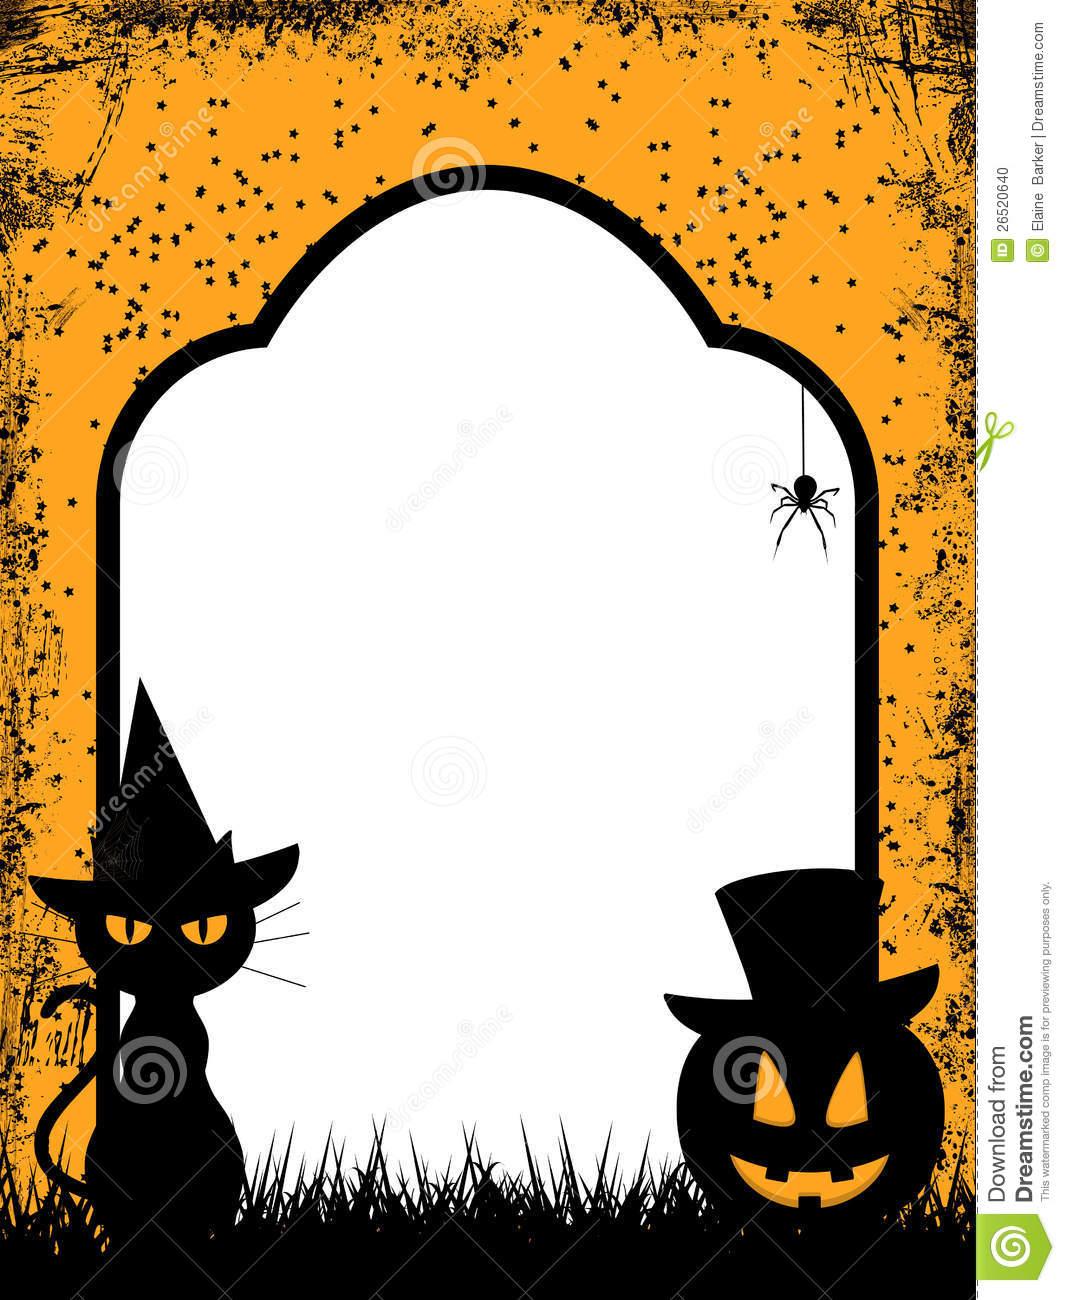 Border Clipart Halloween Bord - Free Halloween Clip Art Borders